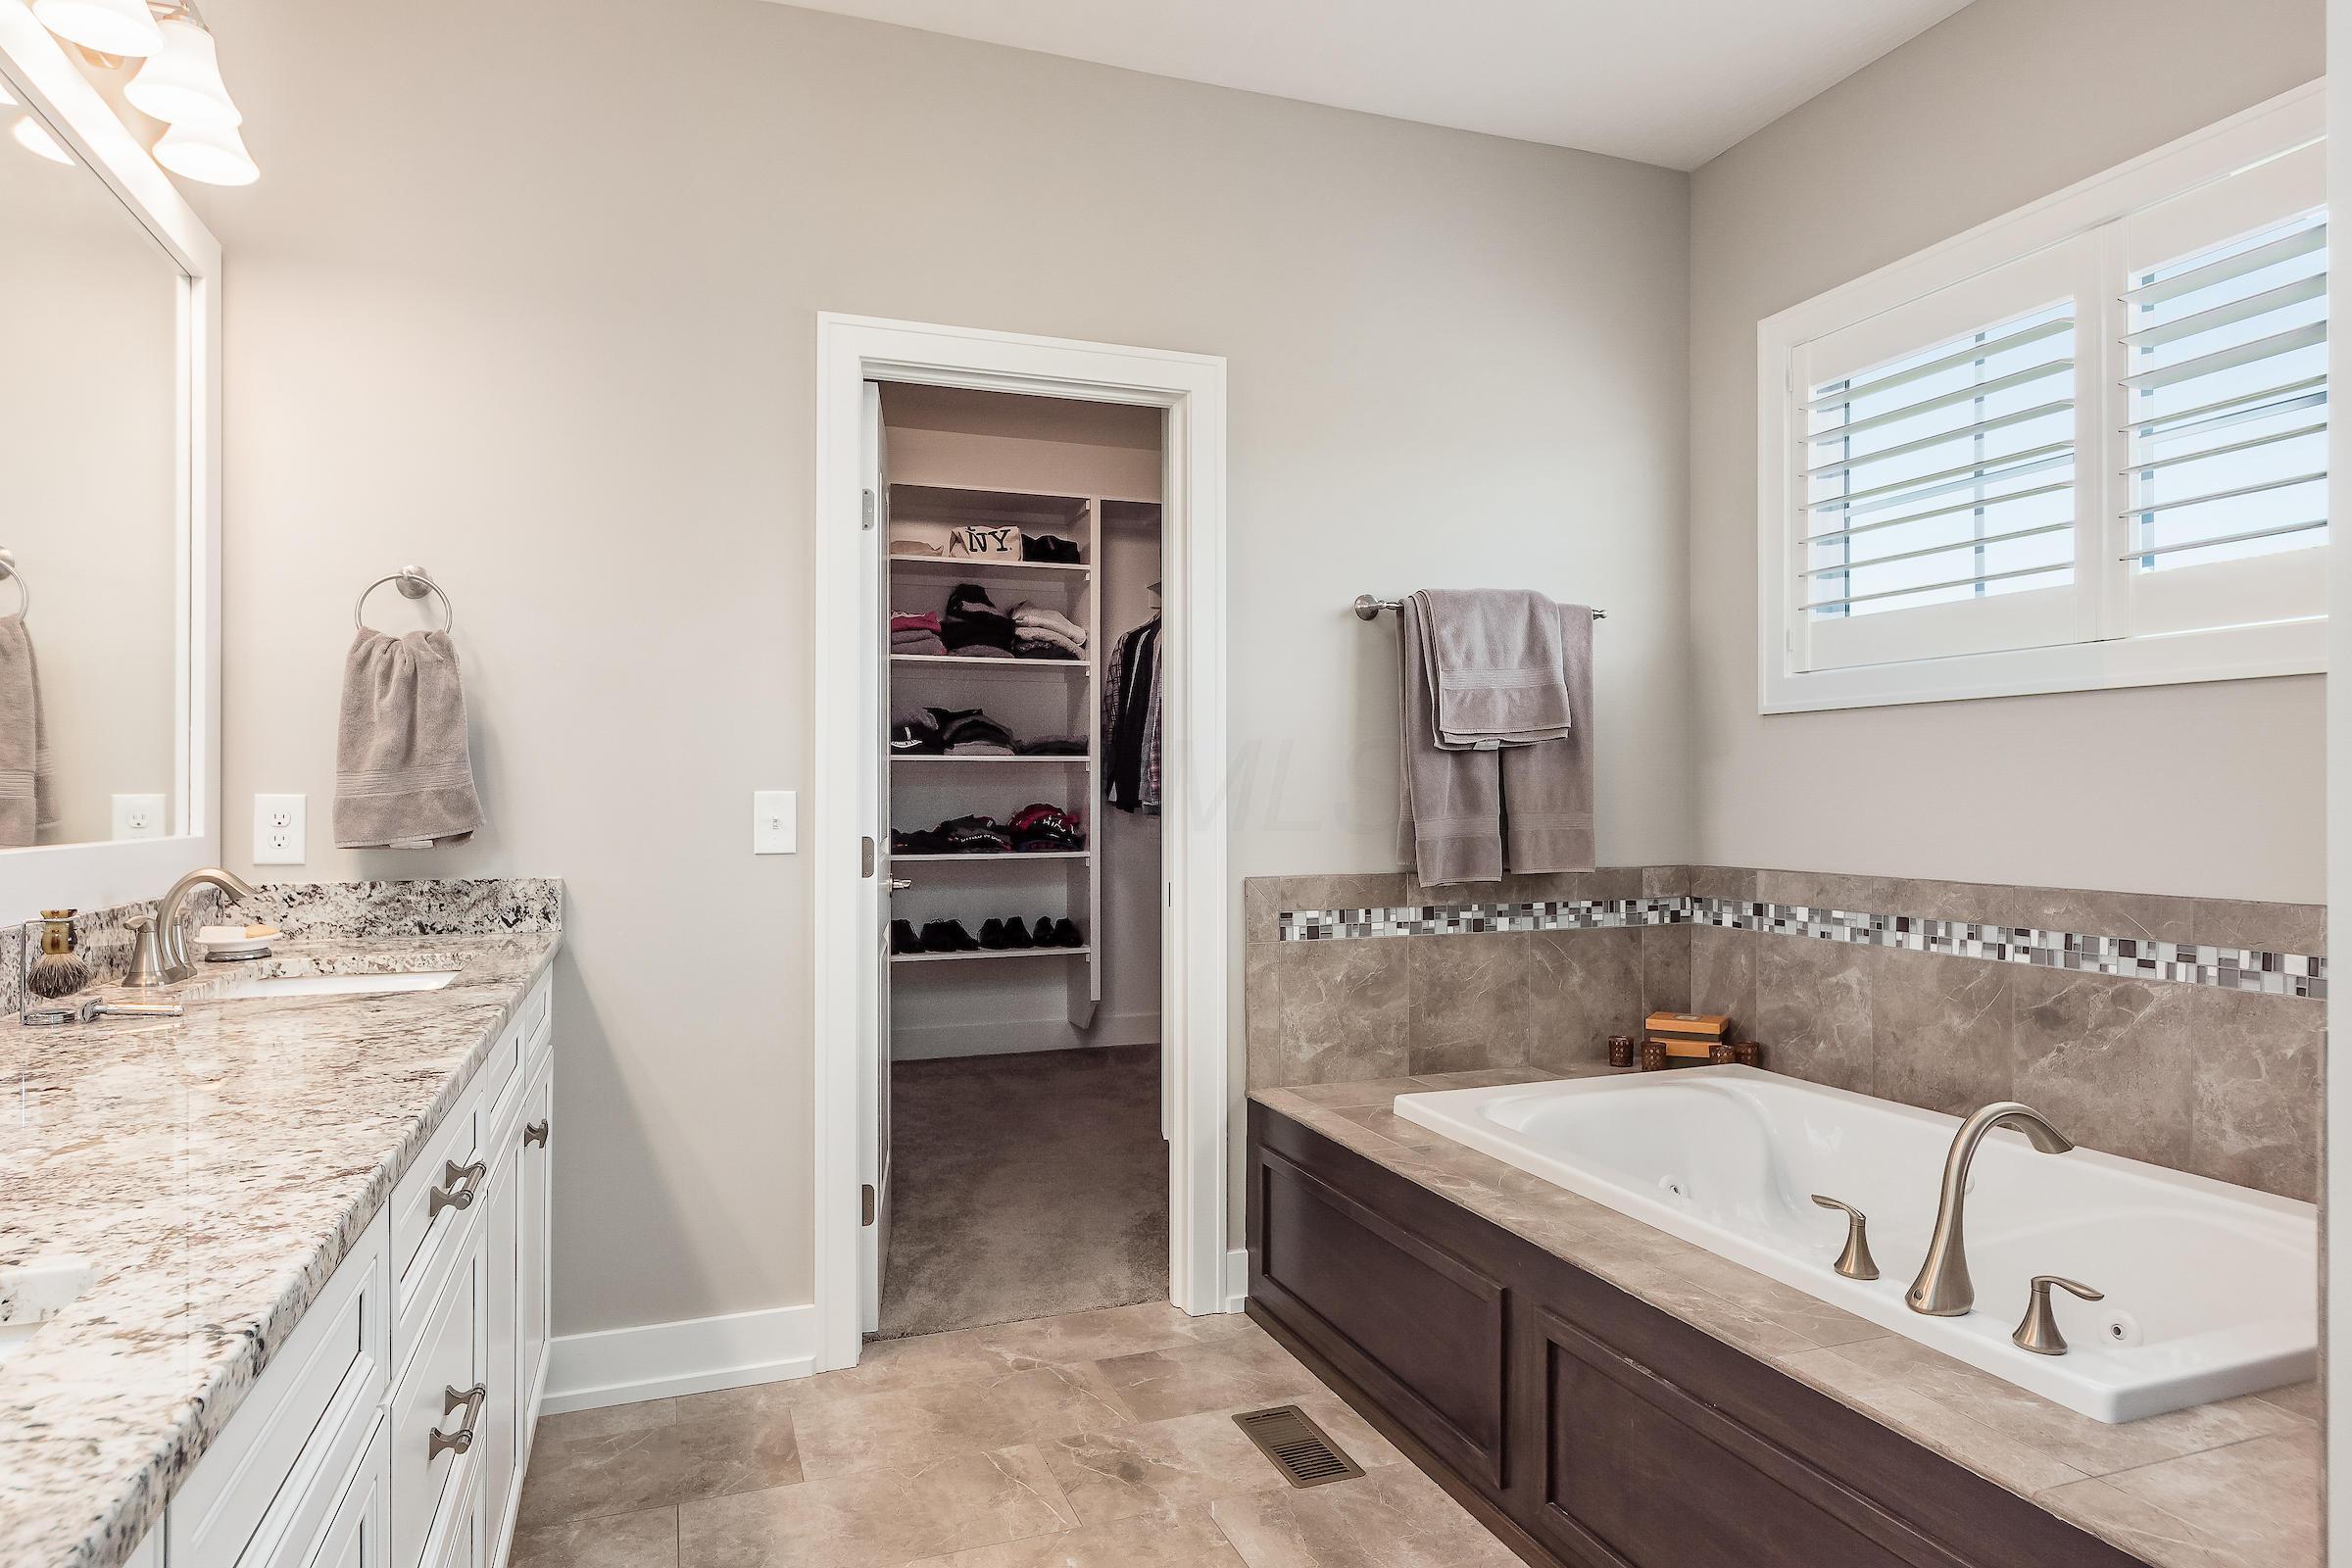 10728 Arrowwood Drive, Plain City, Ohio 43064, 4 Bedrooms Bedrooms, ,4 BathroomsBathrooms,Residential,For Sale,Arrowwood,220018926